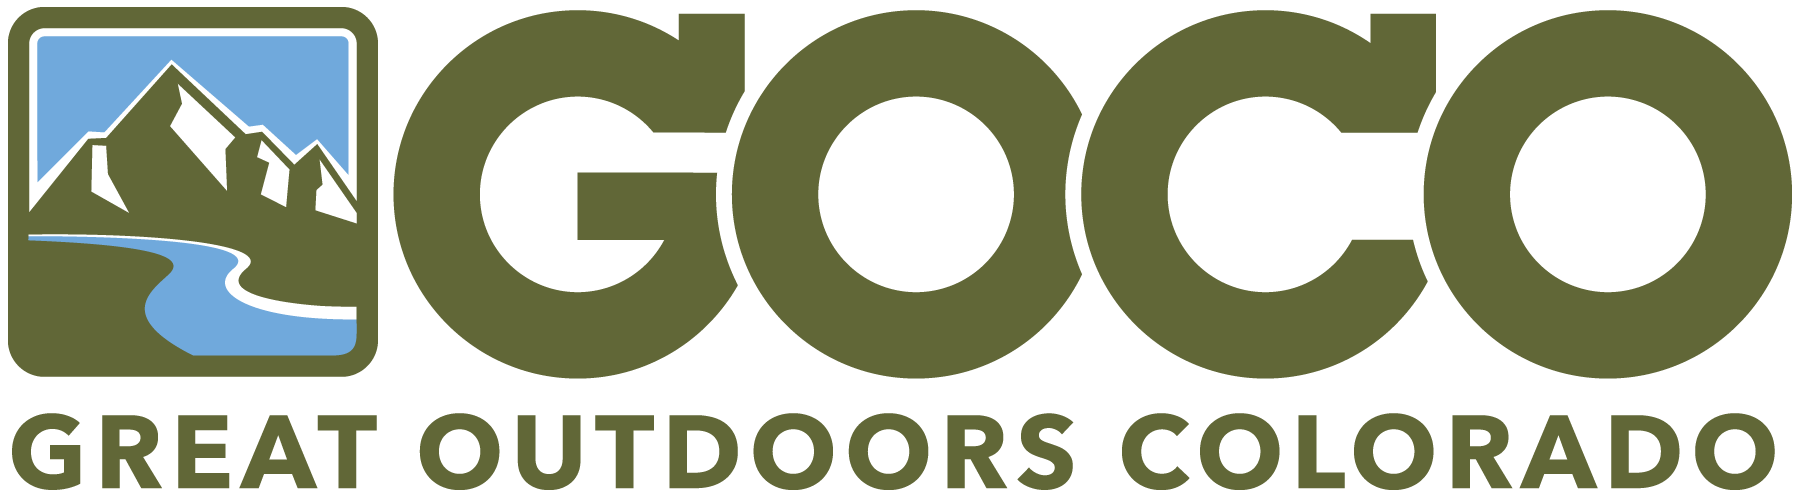 GOCO_logo.png